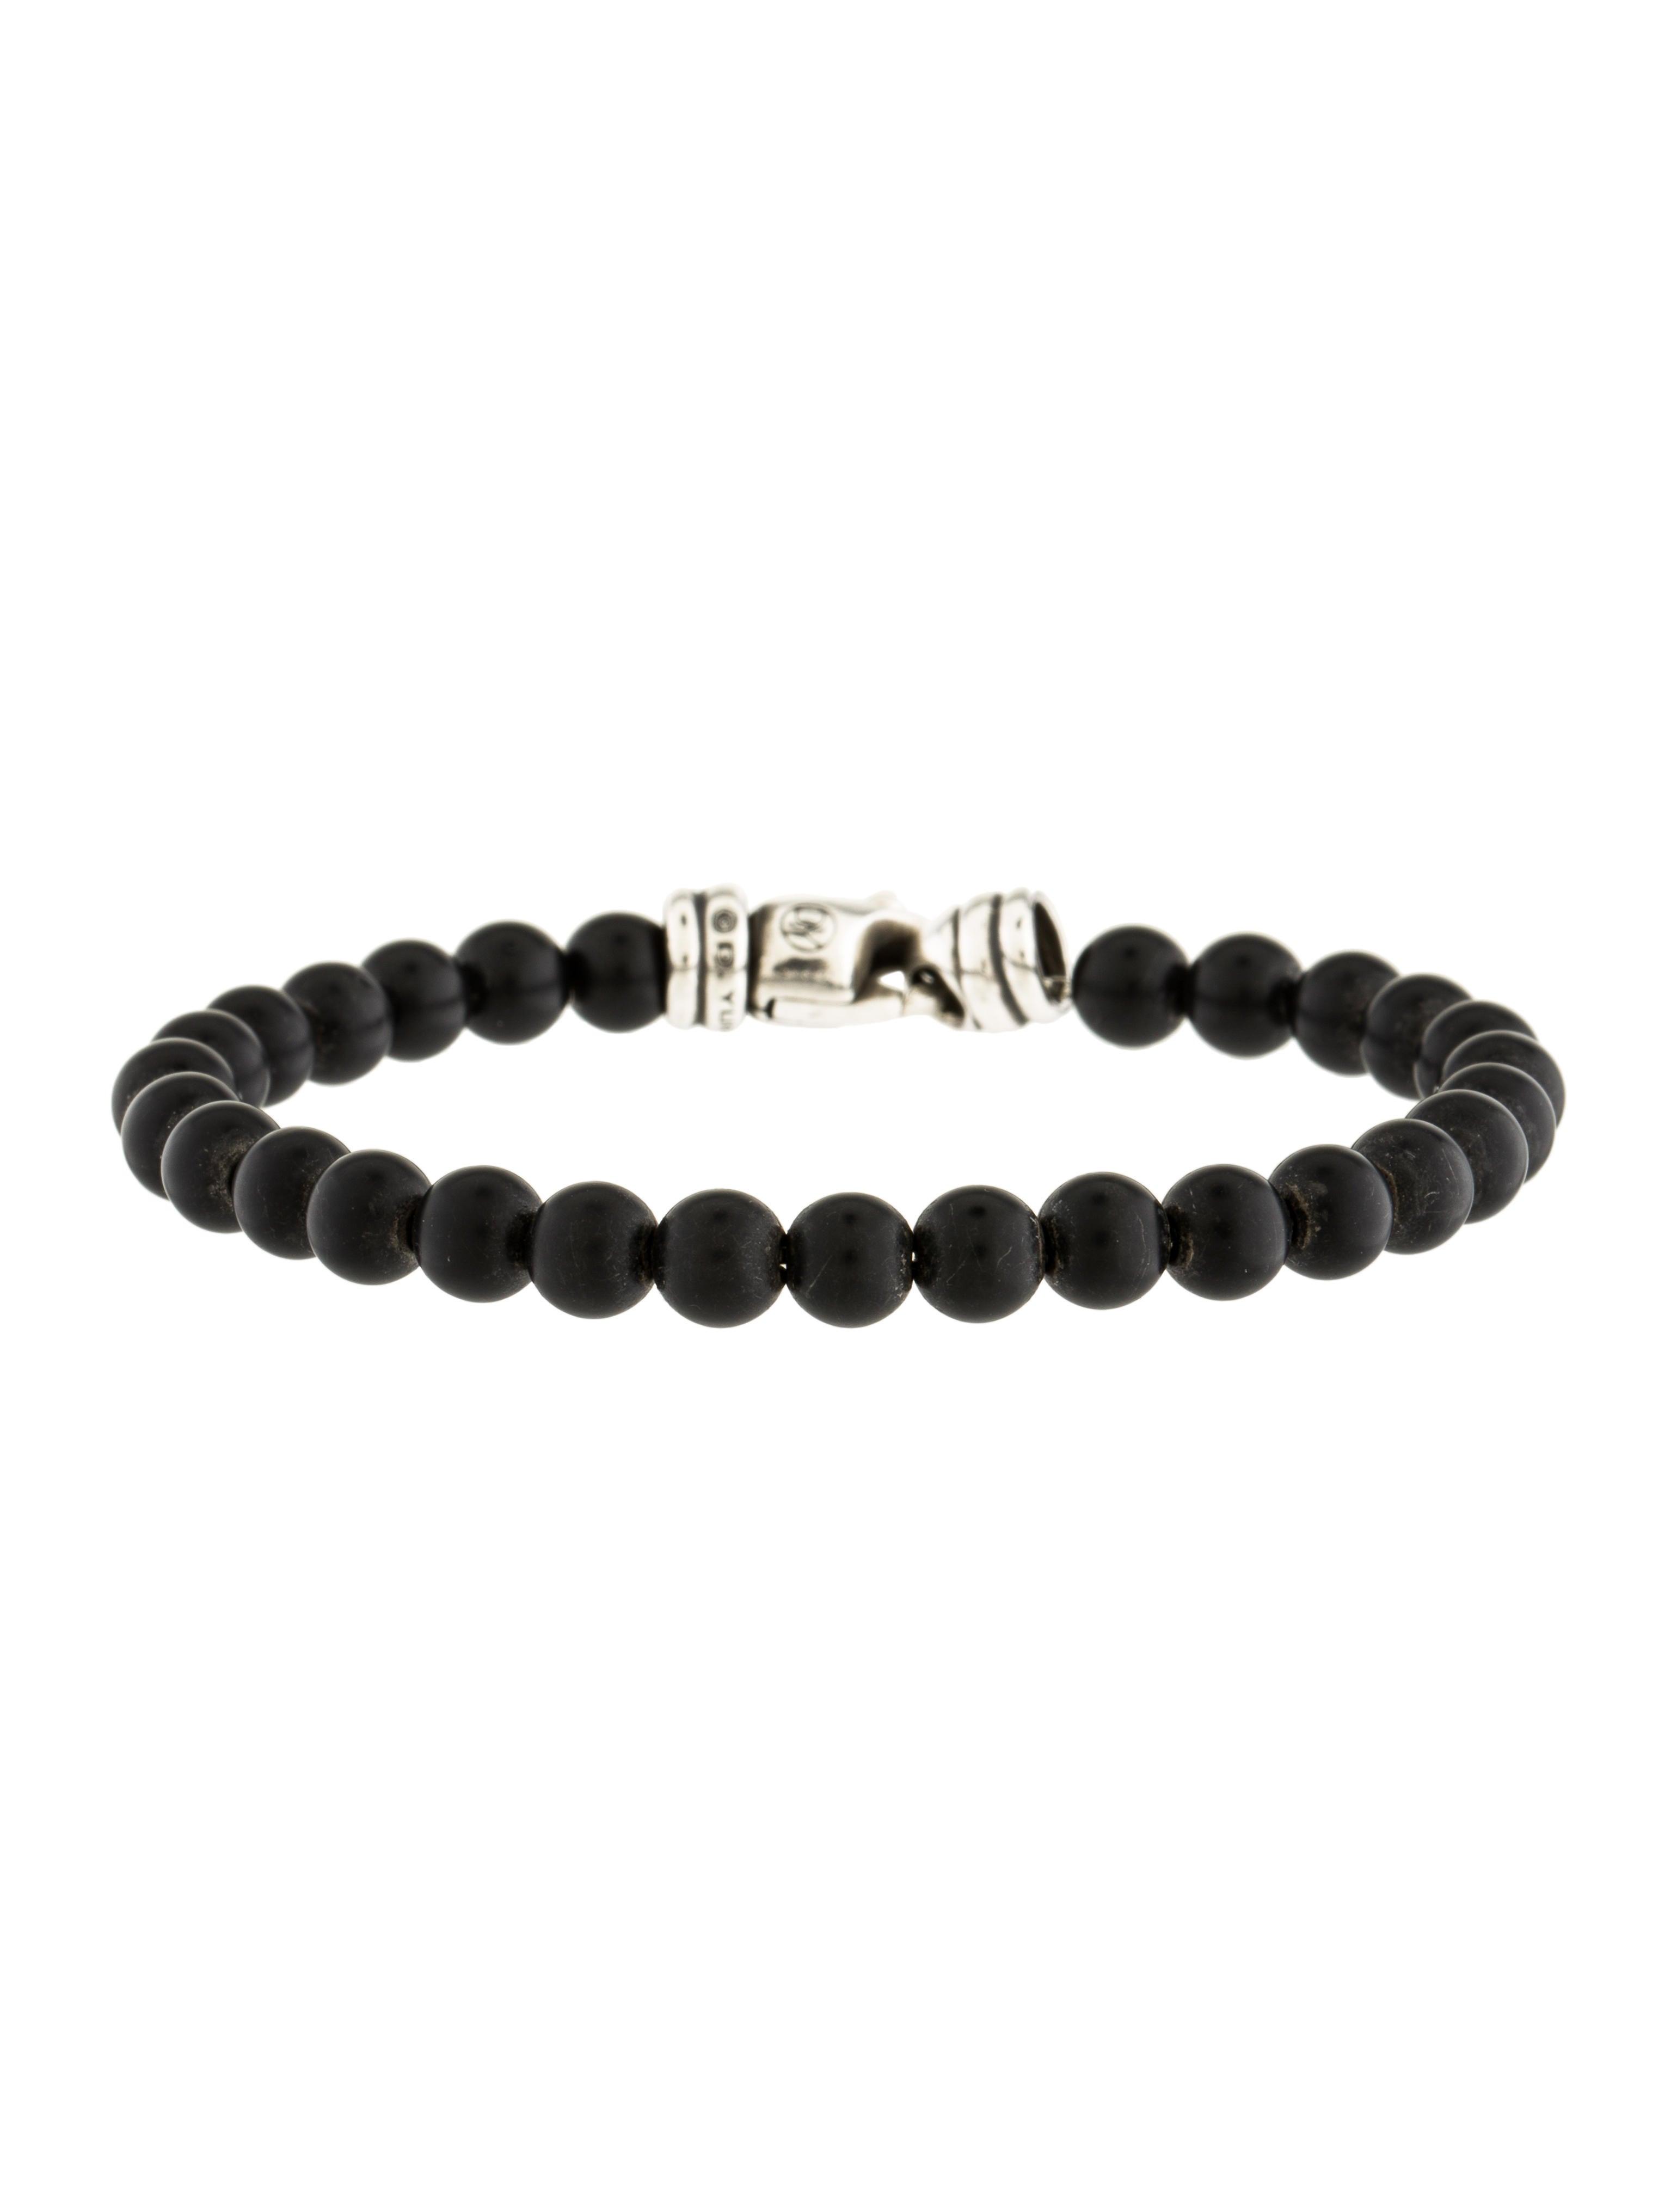 david yurman onyx bead bracelet bracelets dvy39441